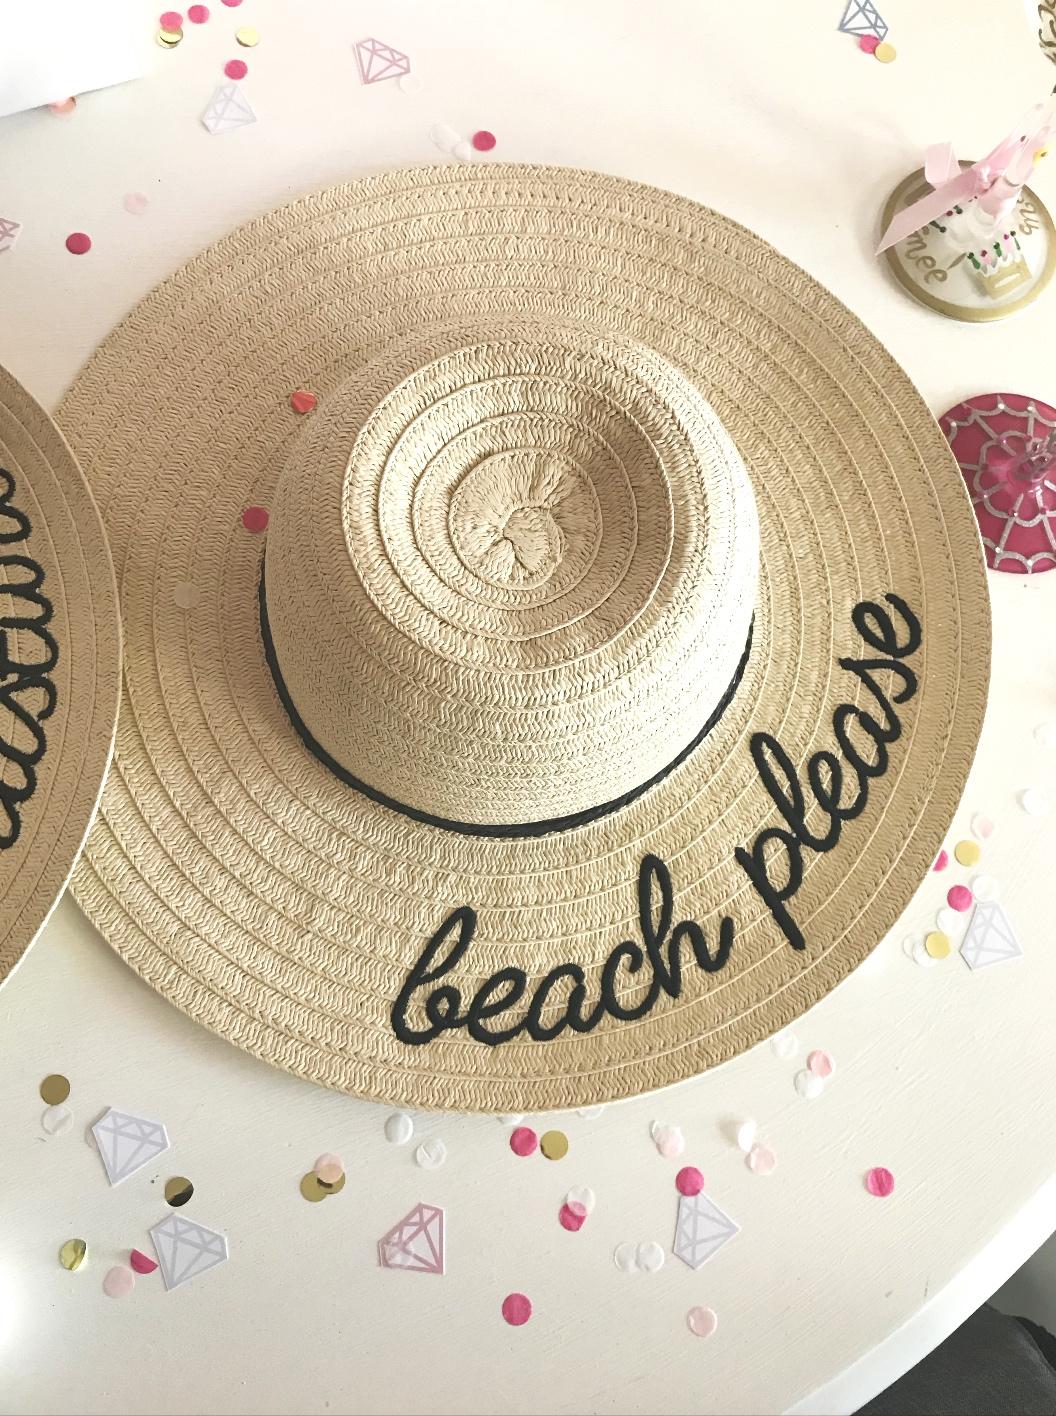 Cheap+sun+hat+bachelorette+party+bride.jpg